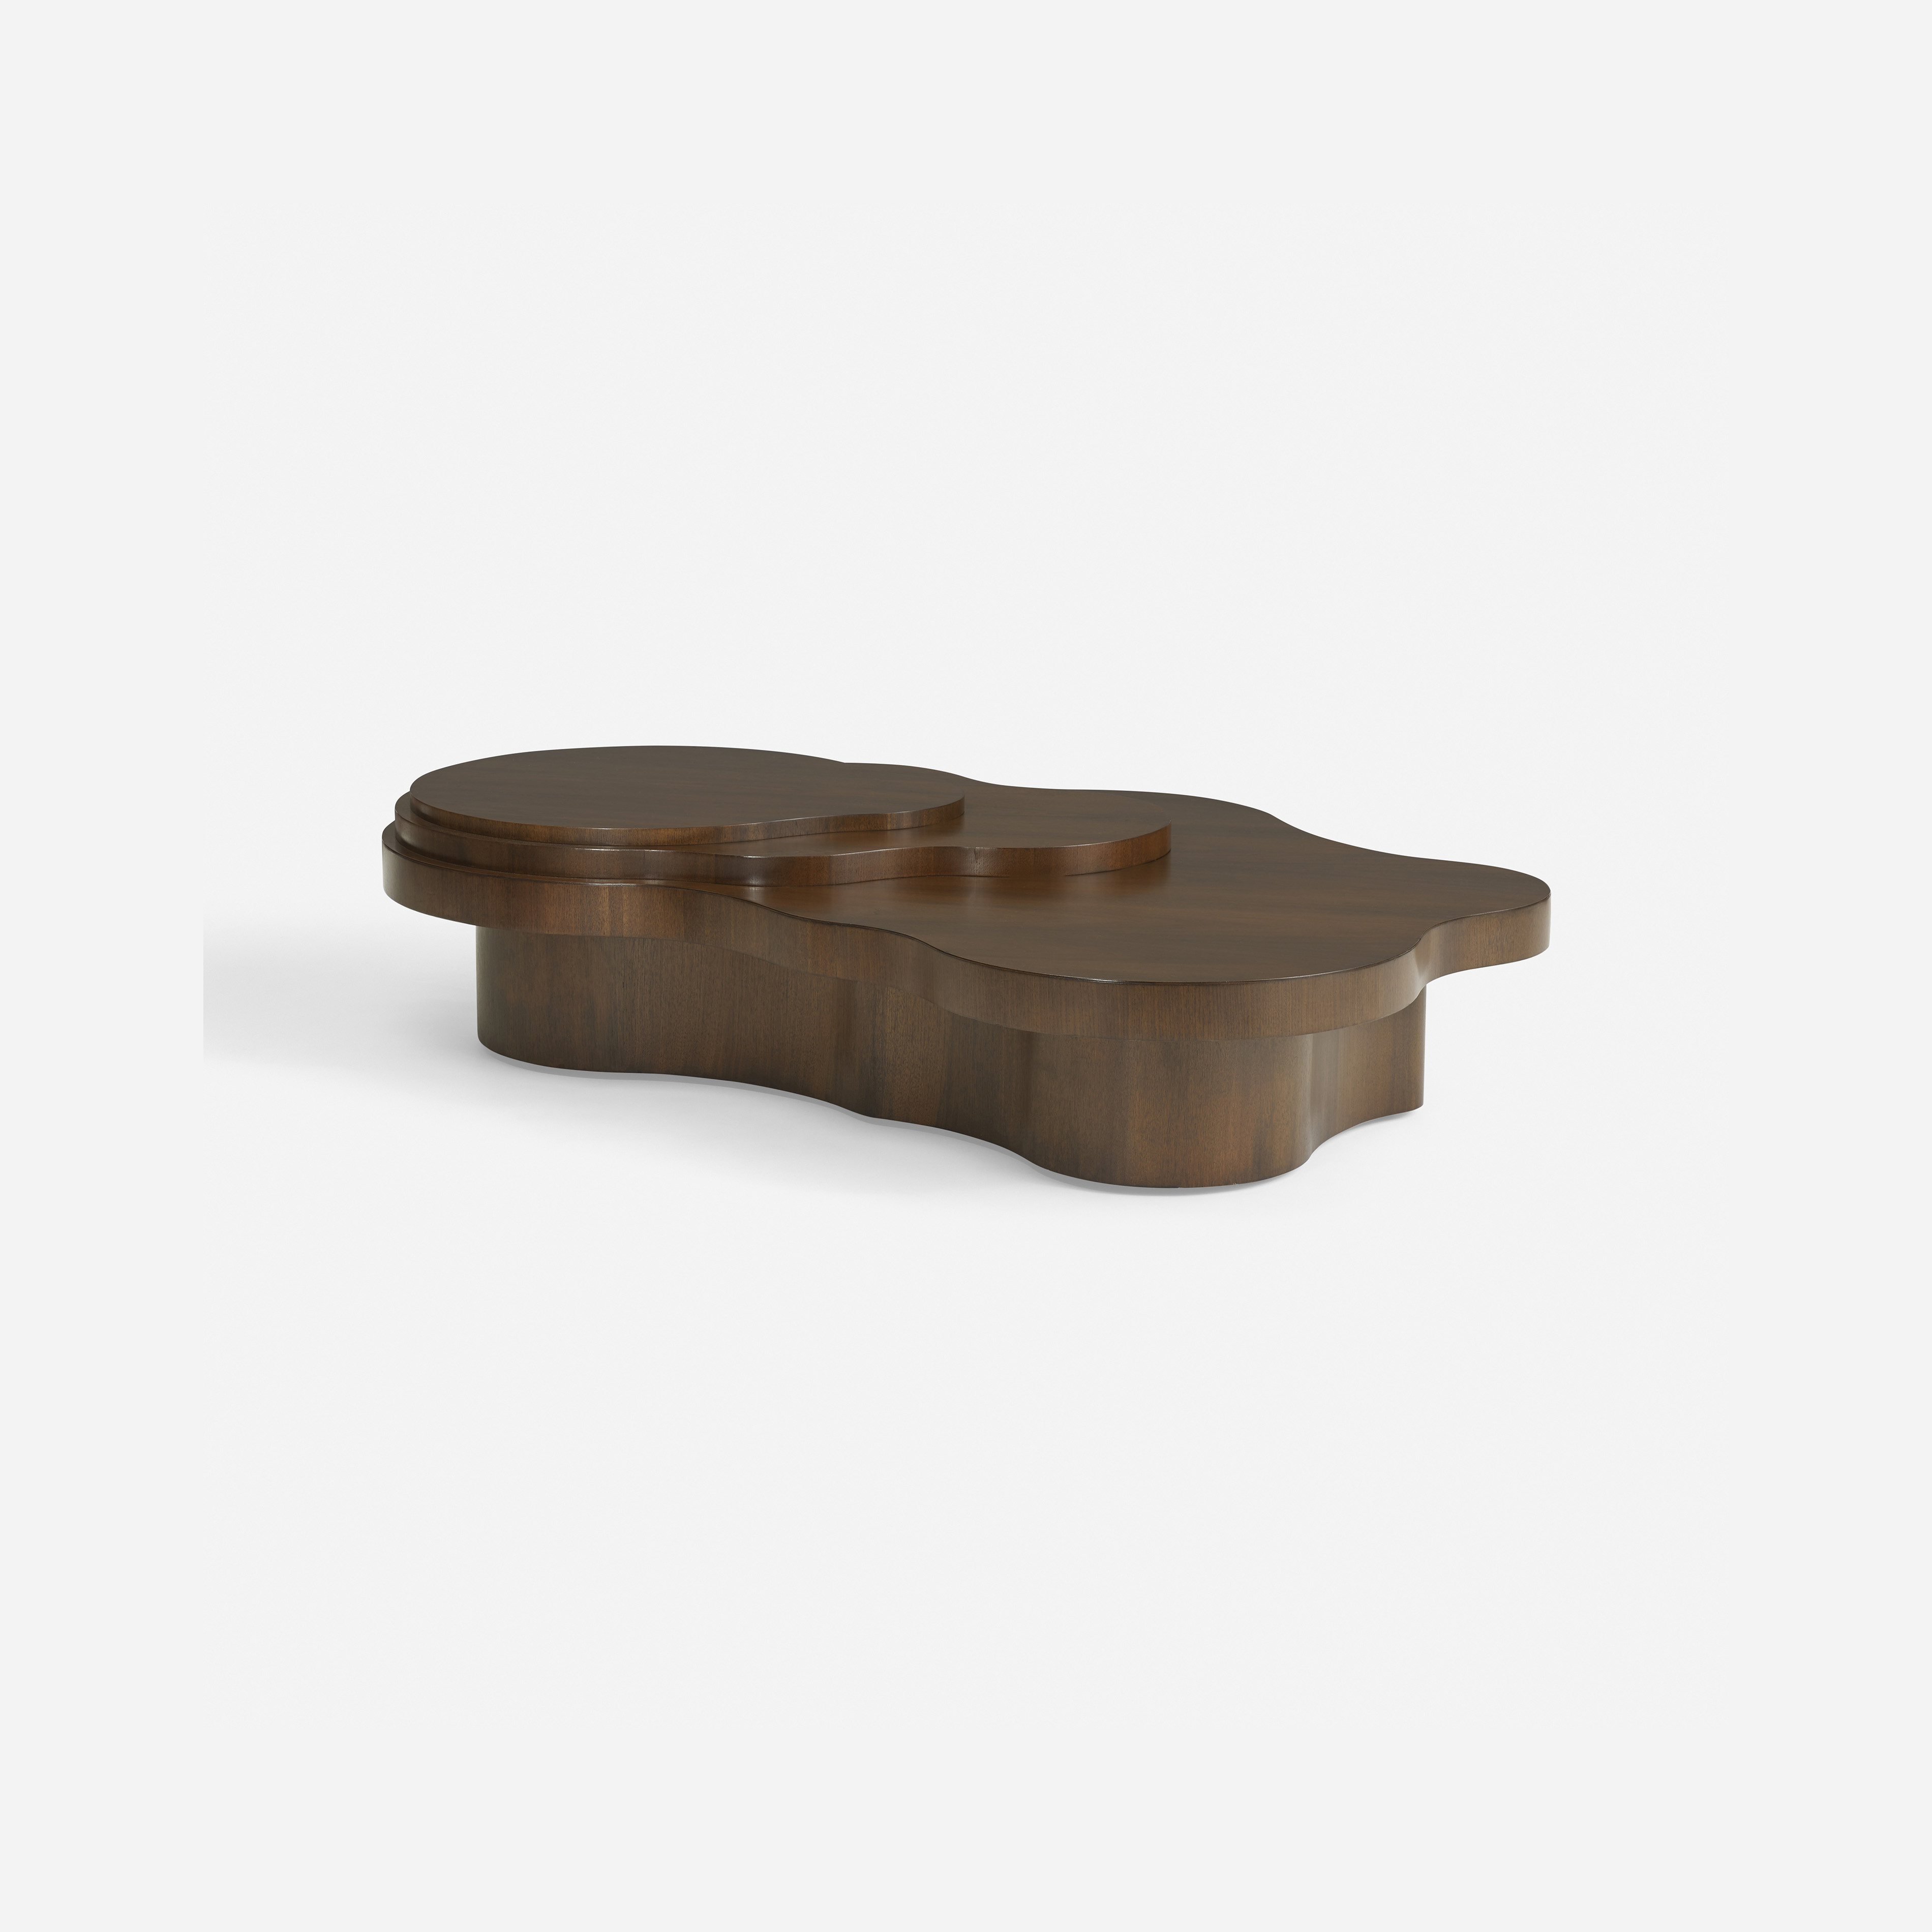 185 T H Robsjohn Gibbings important Mesa coffee table model